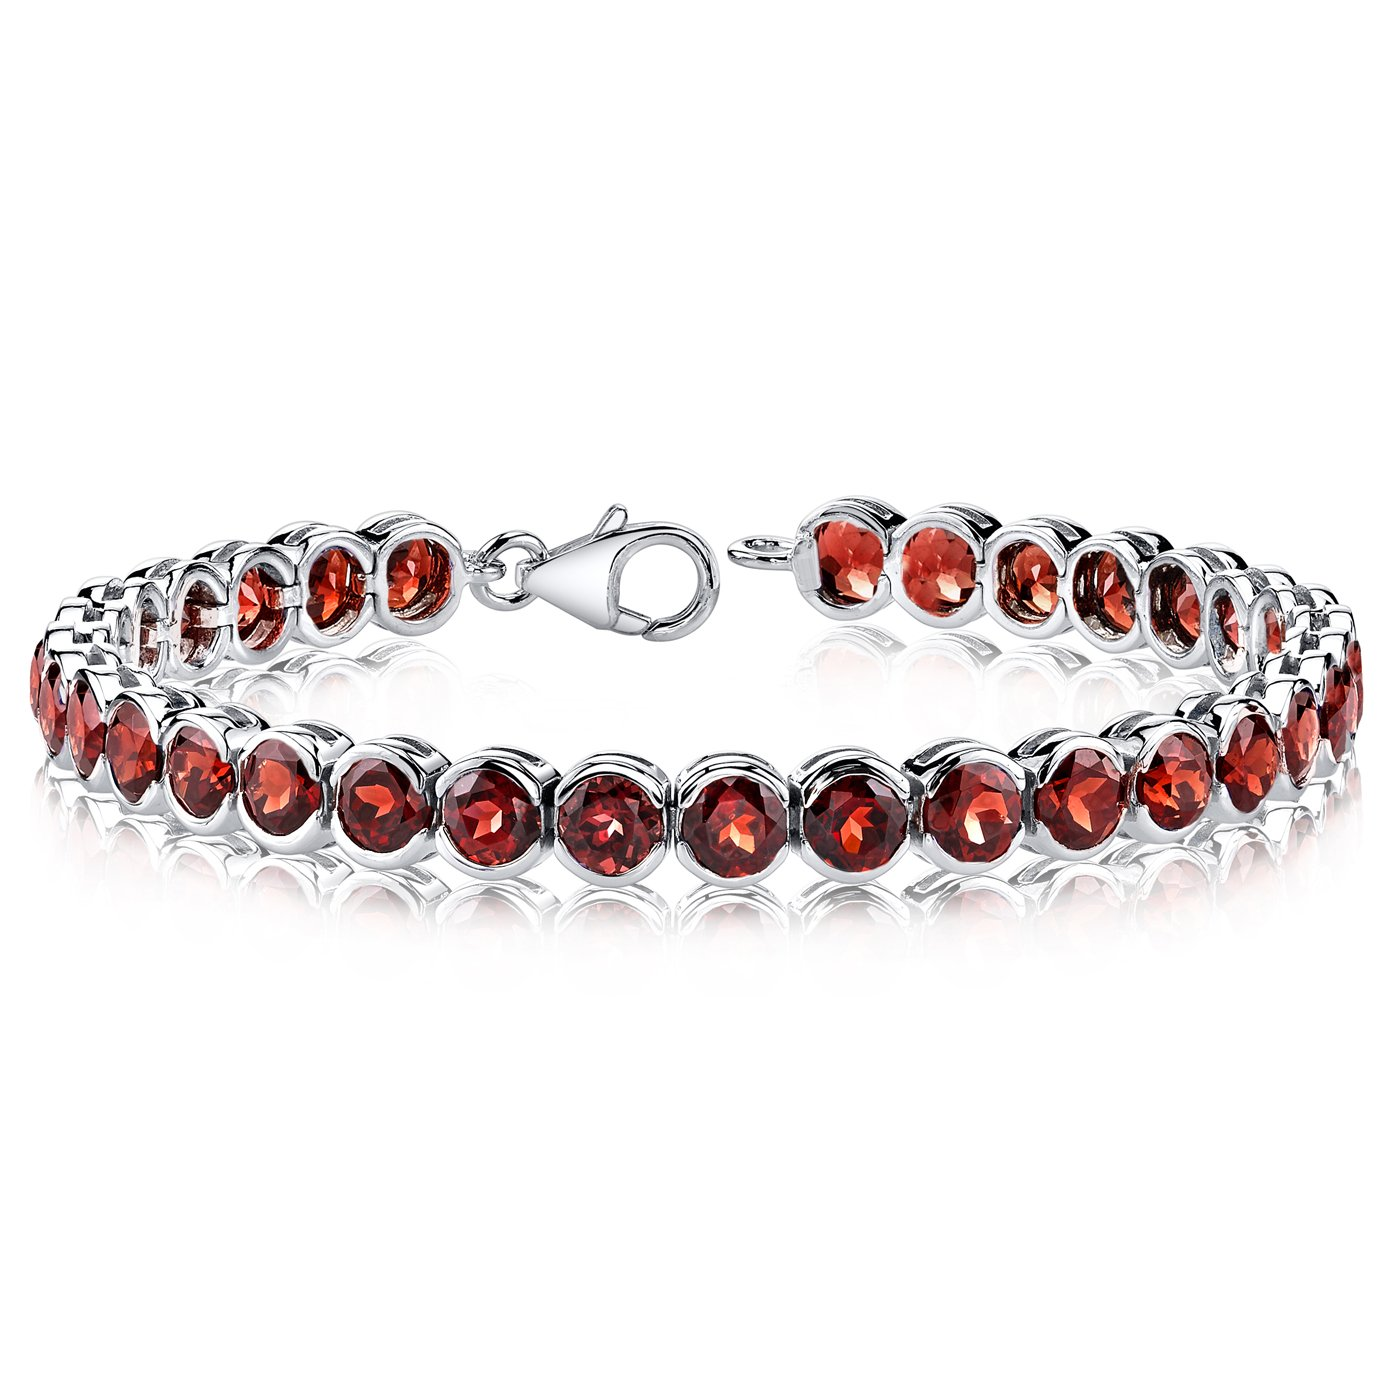 Peora 19.75 Carats Garnet Tennis Bracelet Sterling Silver Bezel Set